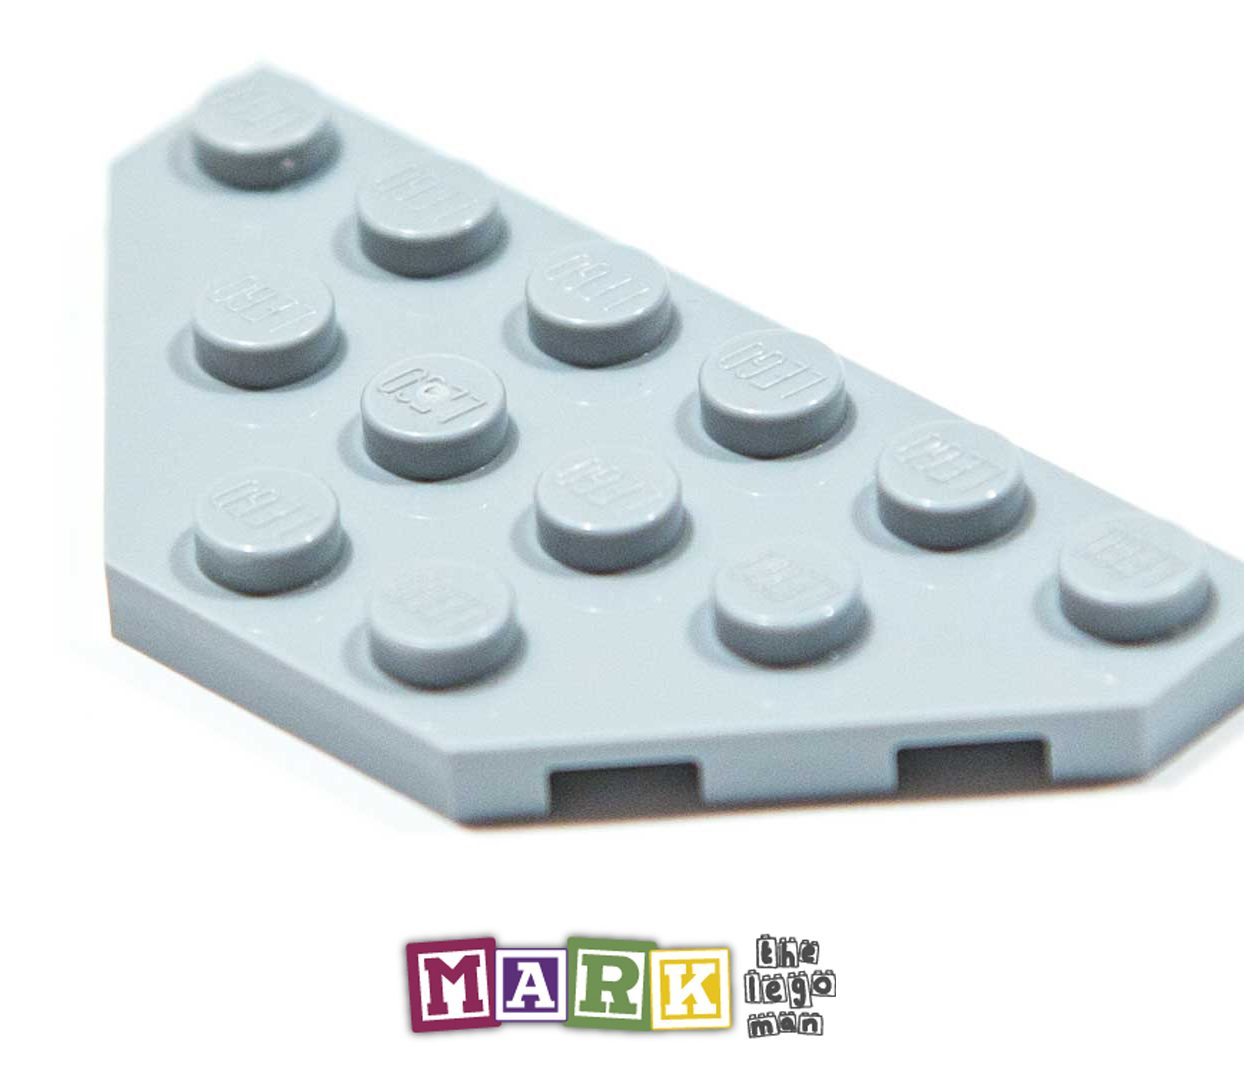 New Lego 2419 3x6 Corner Plate 4211352